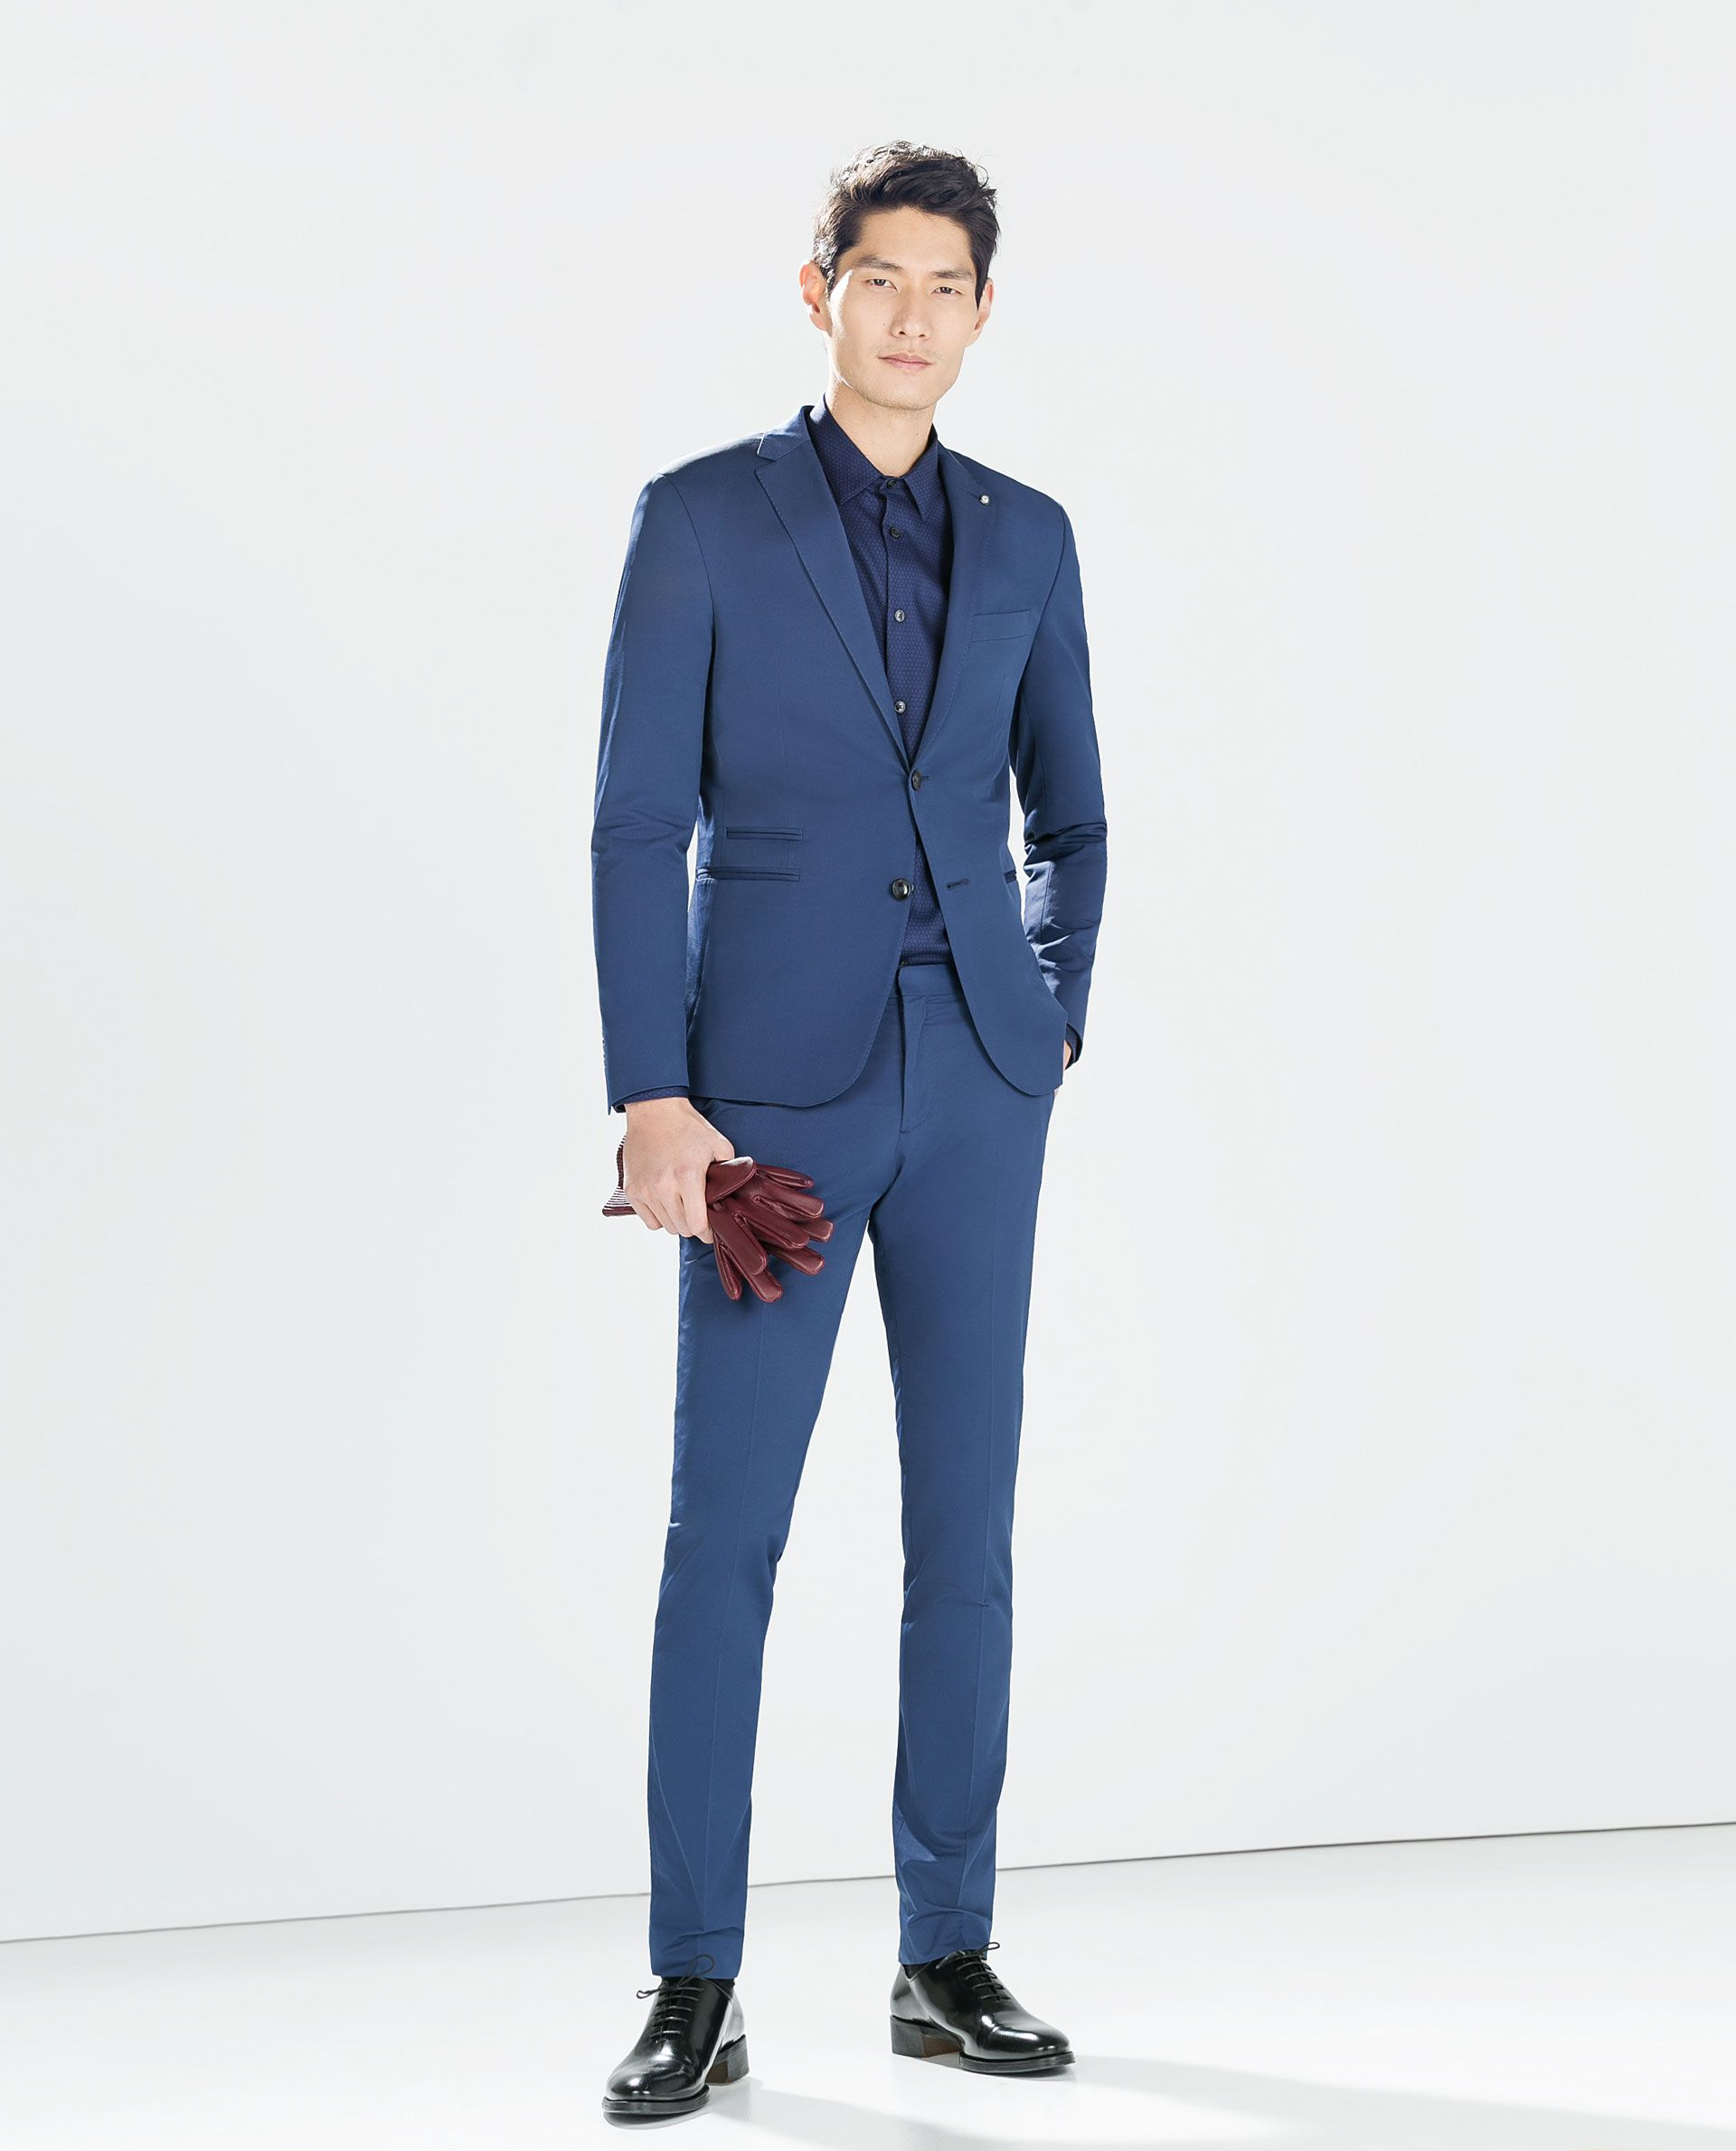 Abiti Eleganti Zara Uomo.Zara Collection Ss15 Blue Blazer With Pocket Costume Homme